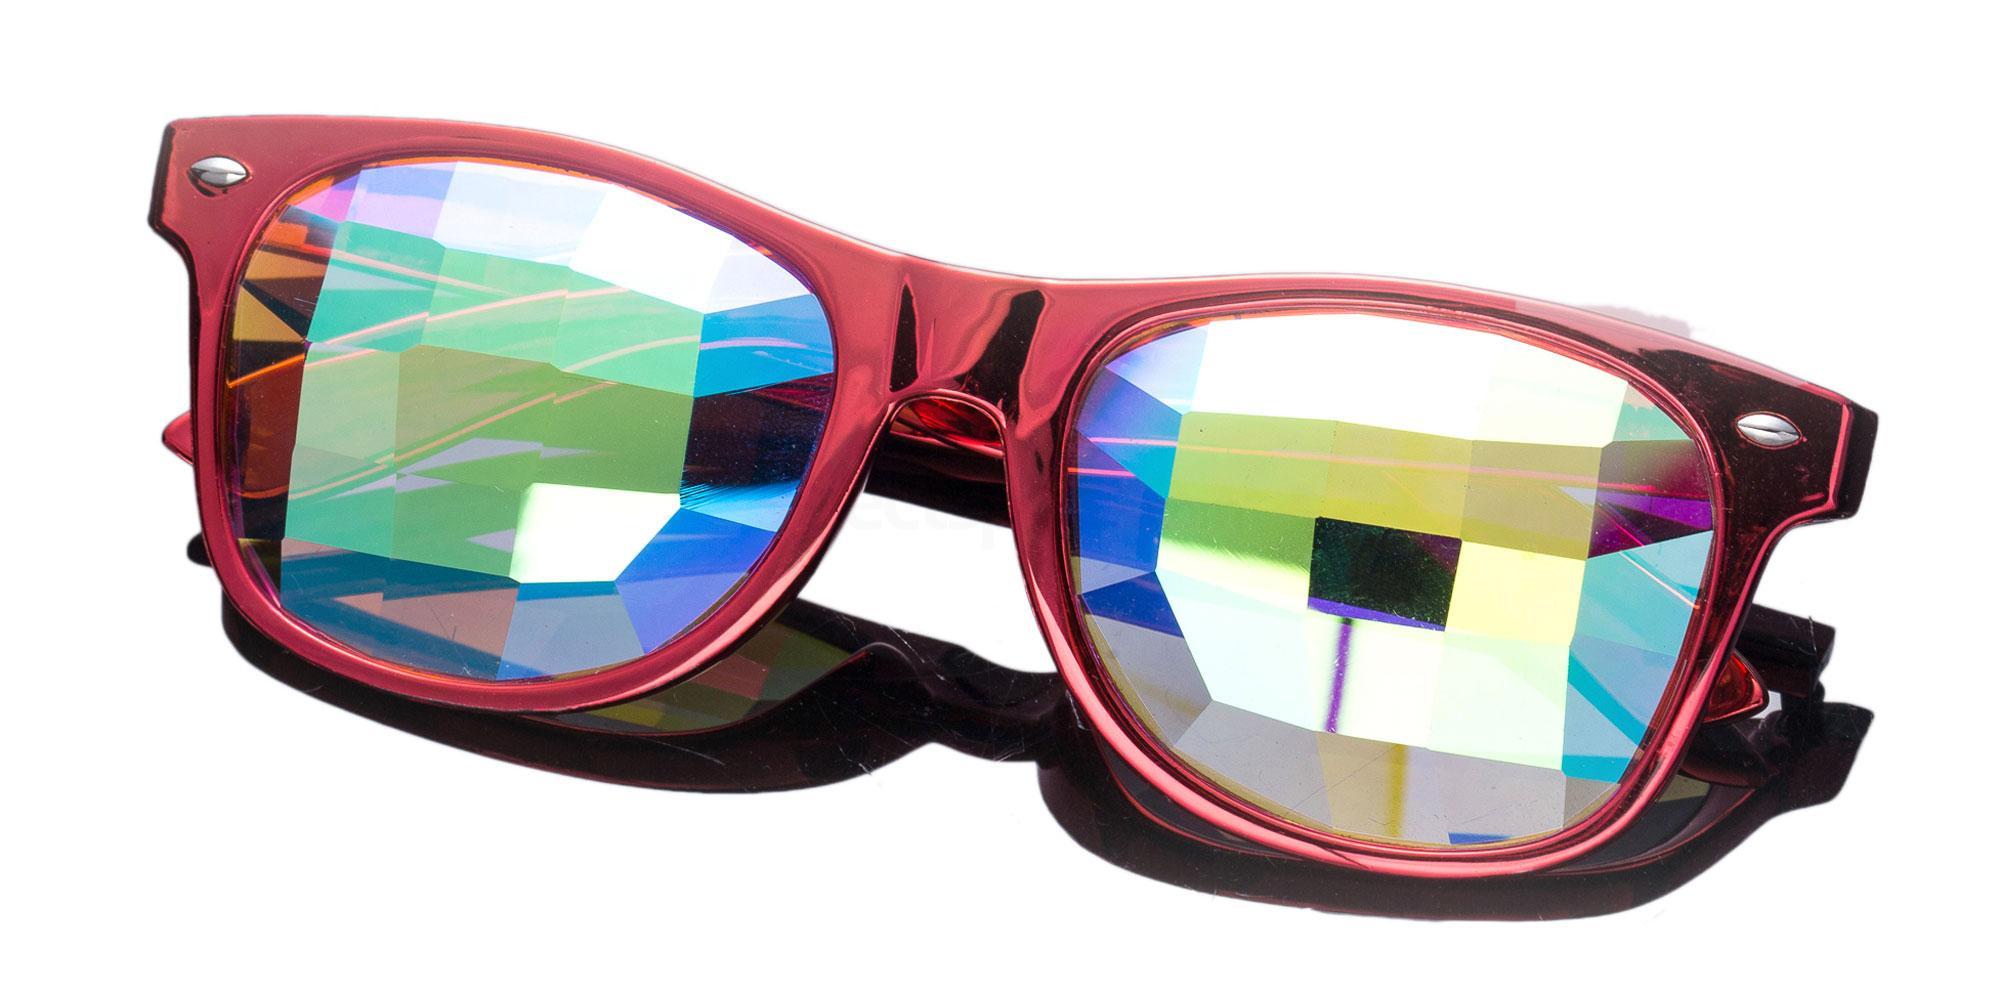 Red Wayfarer Style Frame / Pane Rainbow Lens 1005K-10 Accessories, Kolor Kaleido